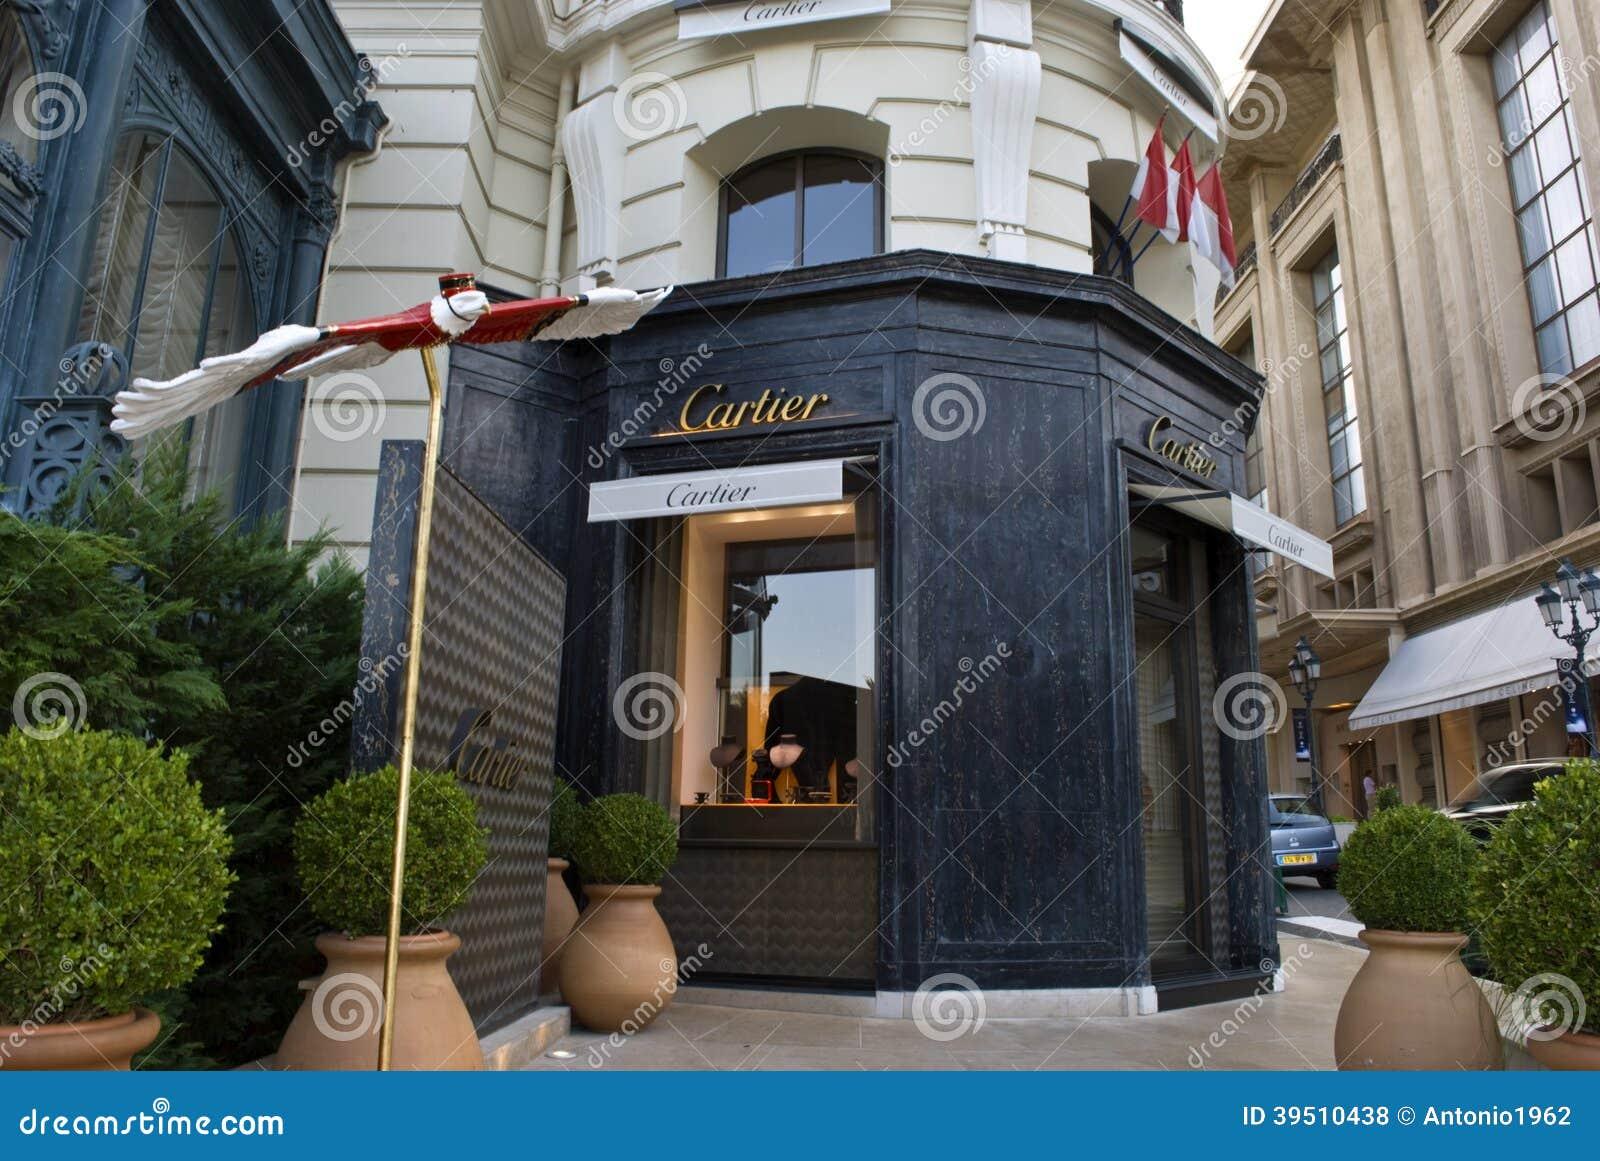 Cartier store -Montecarlo